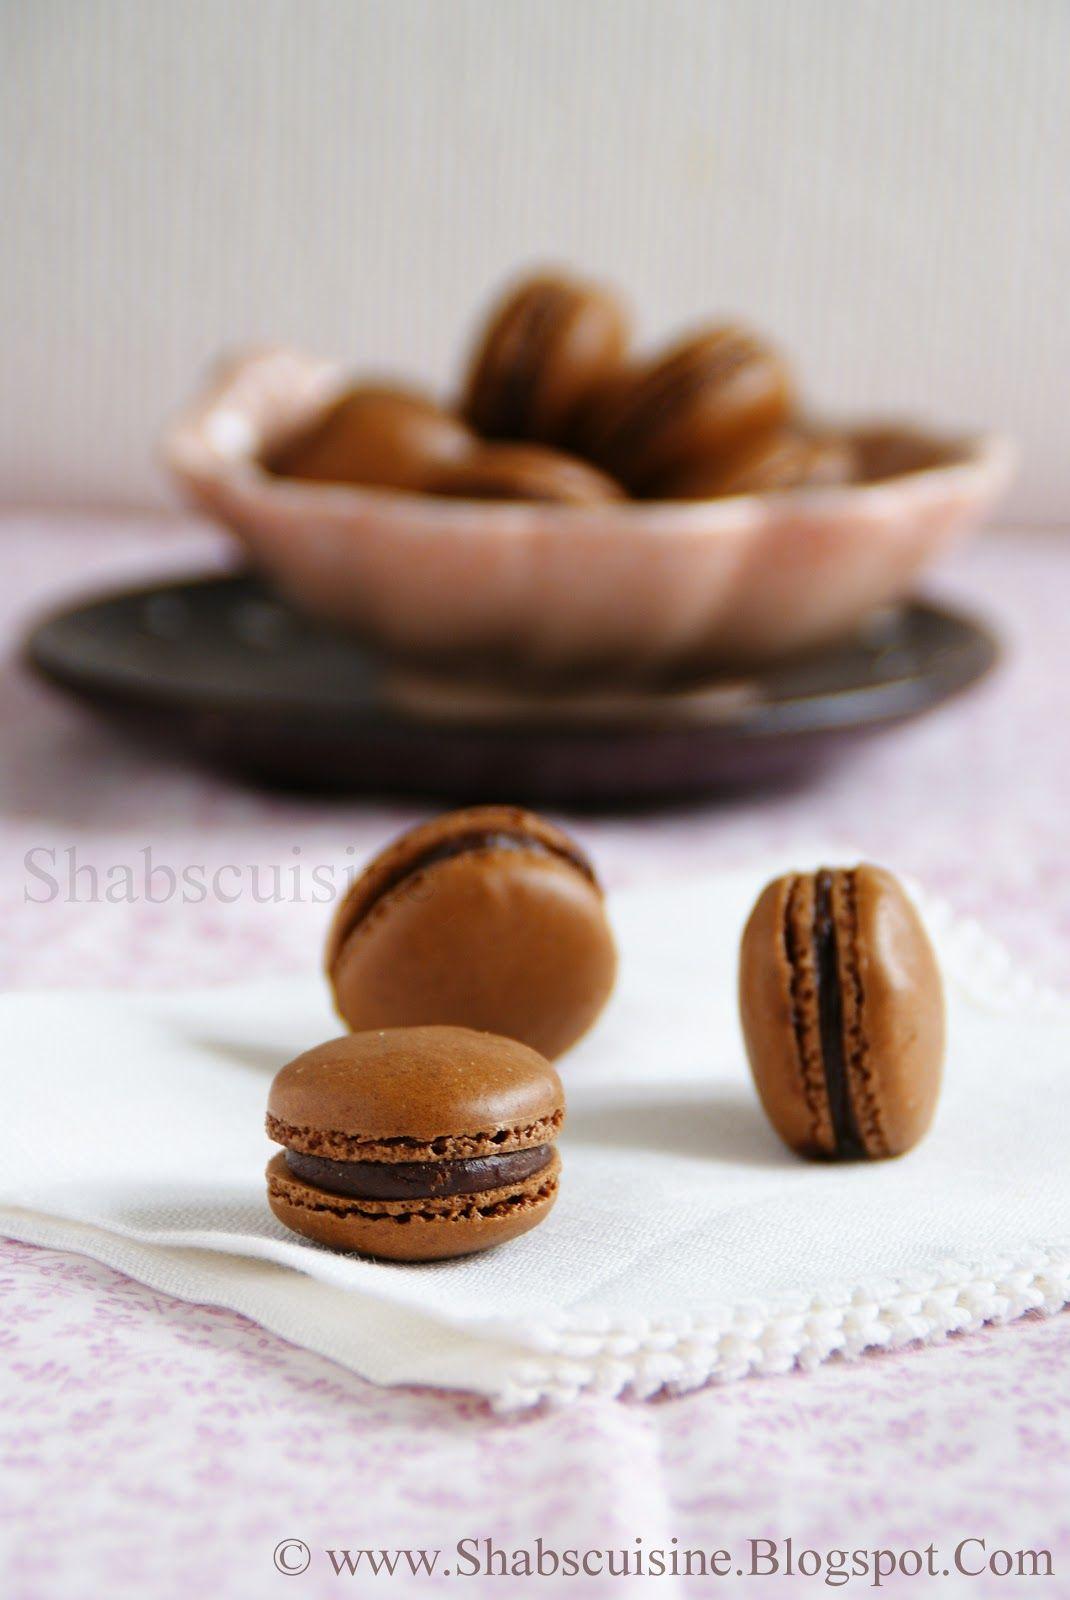 Shab's Cuisine: Chocolate Macarons with Mocha Ganache